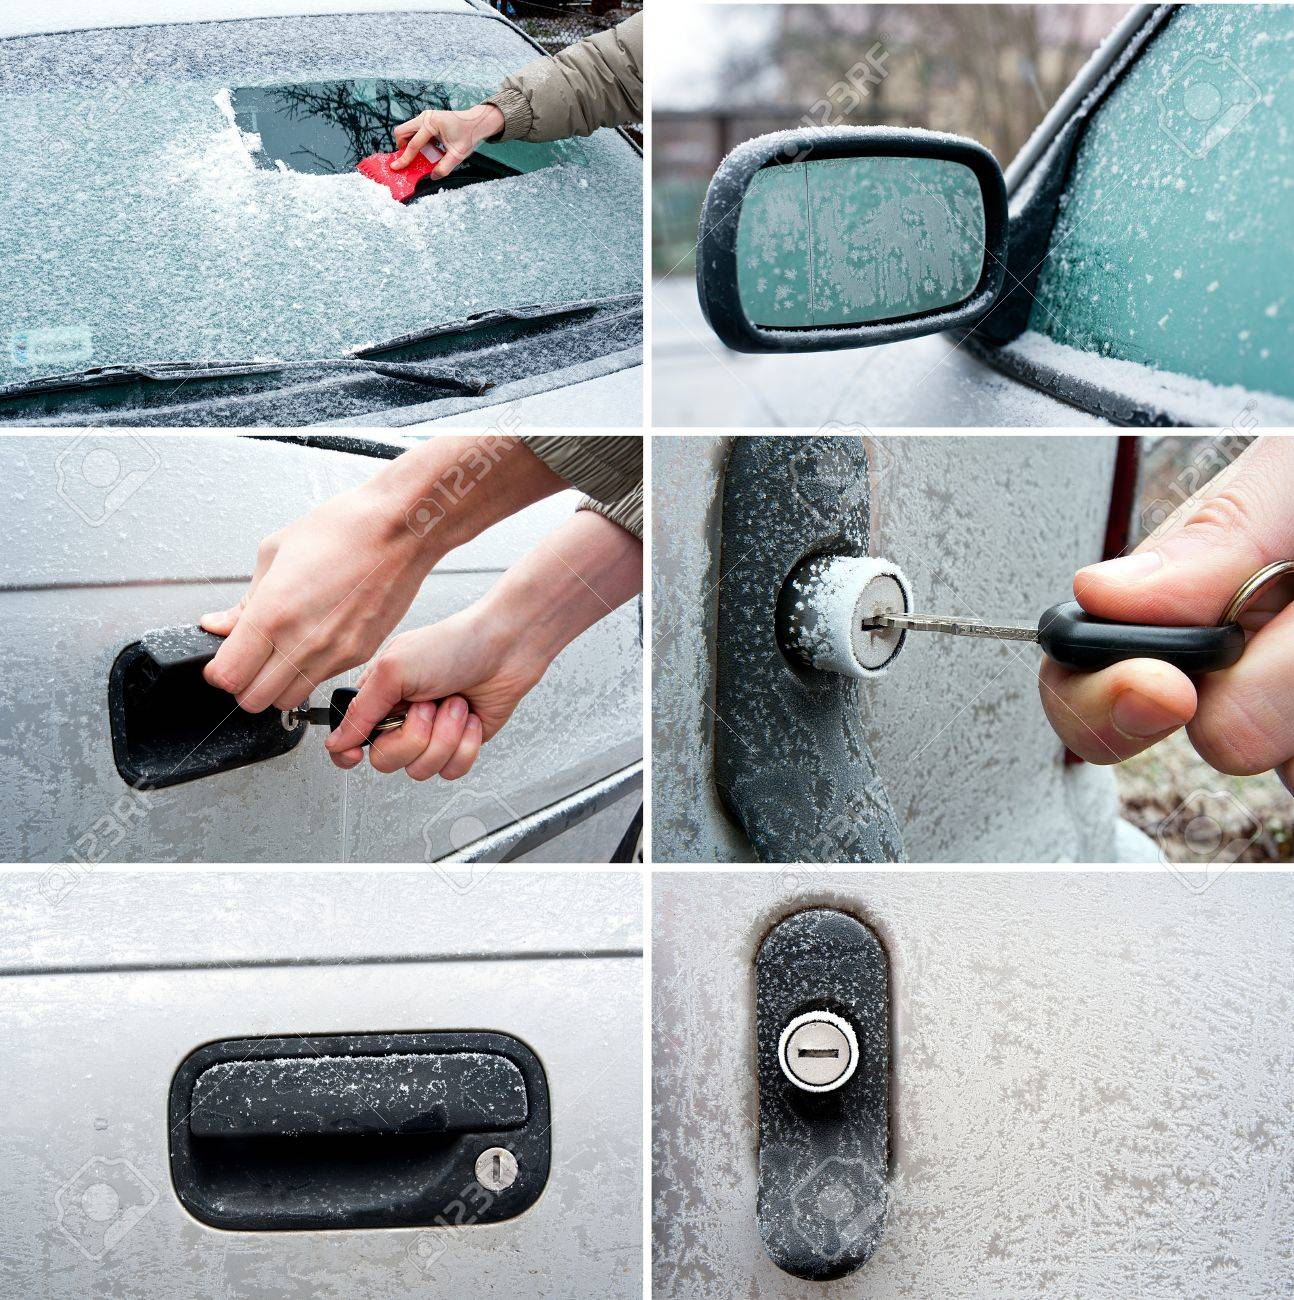 set of frozen car related photos Unlocking a frozen car door - 16729229